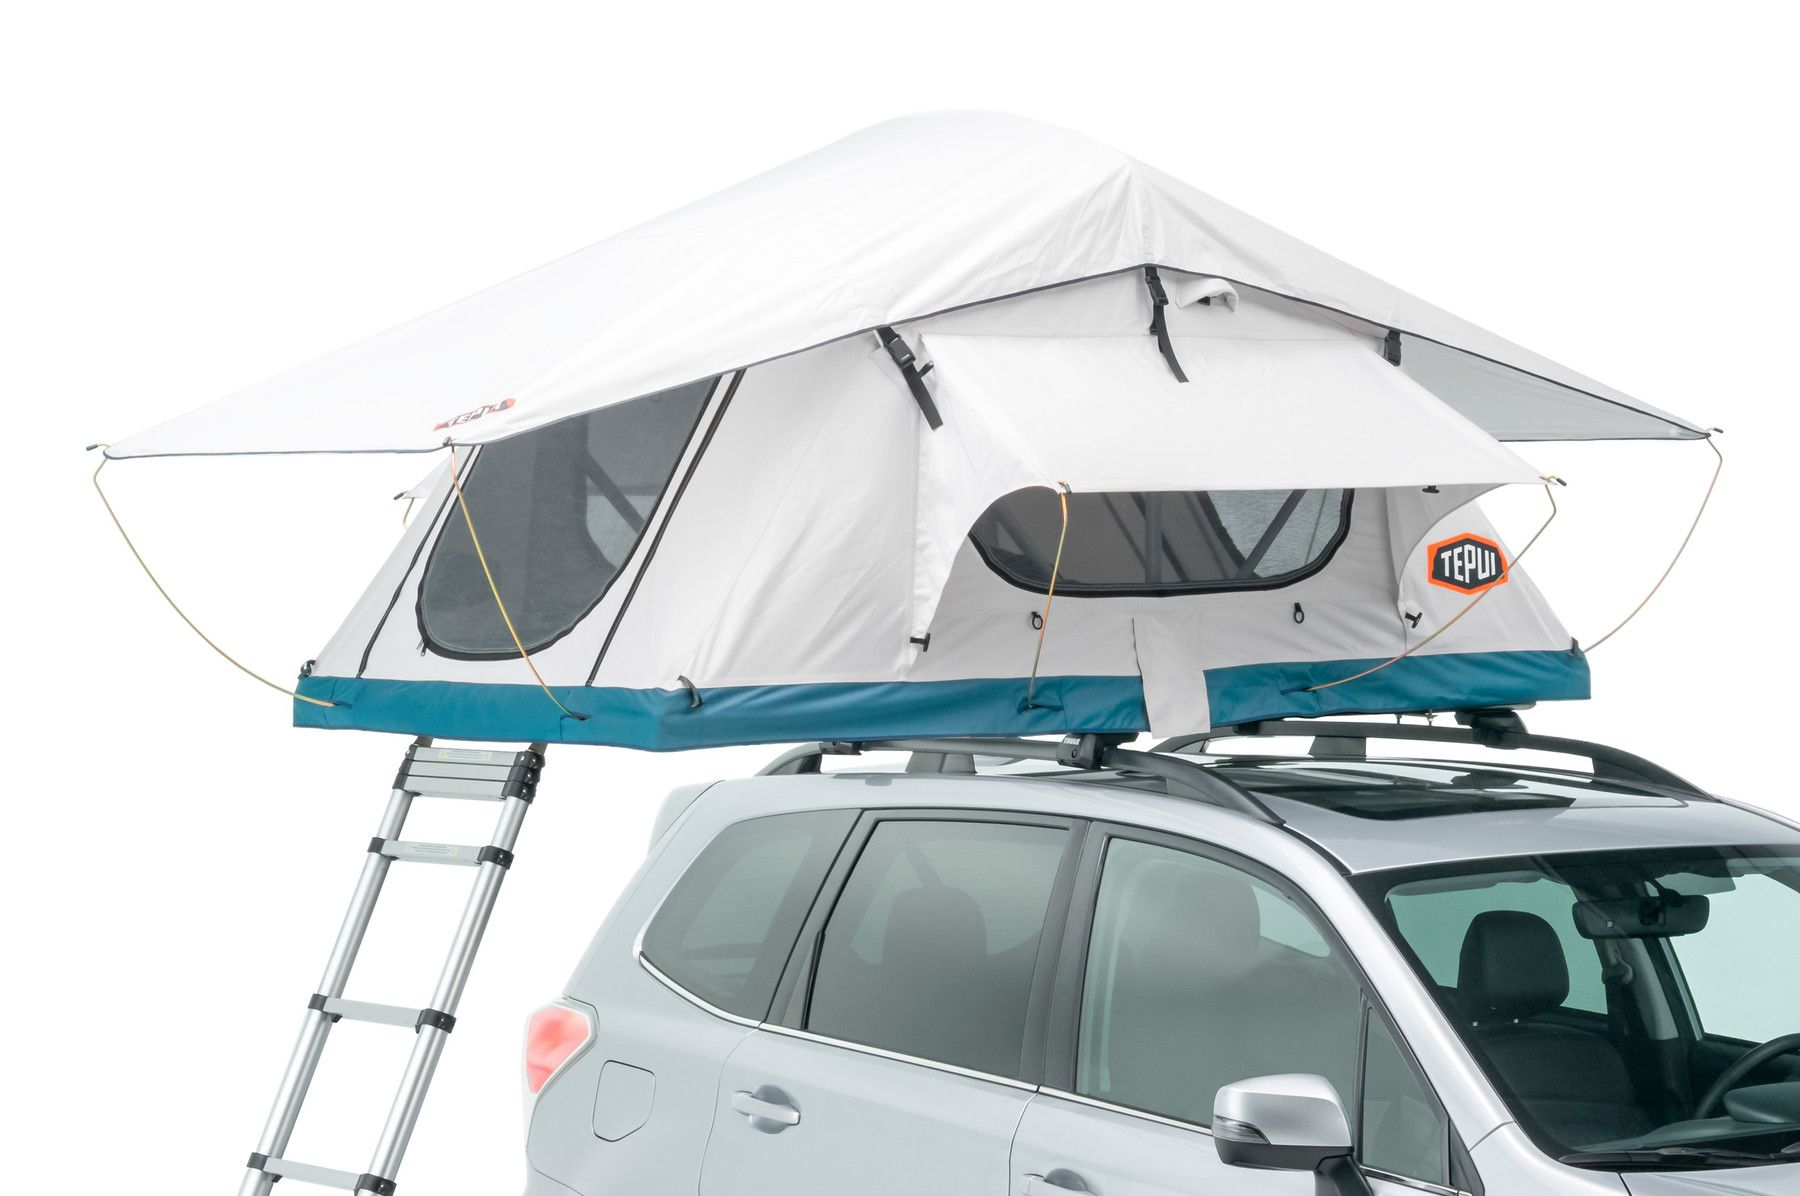 Tepui LowPro 2 Tent, Roof top tent, Lexus gx